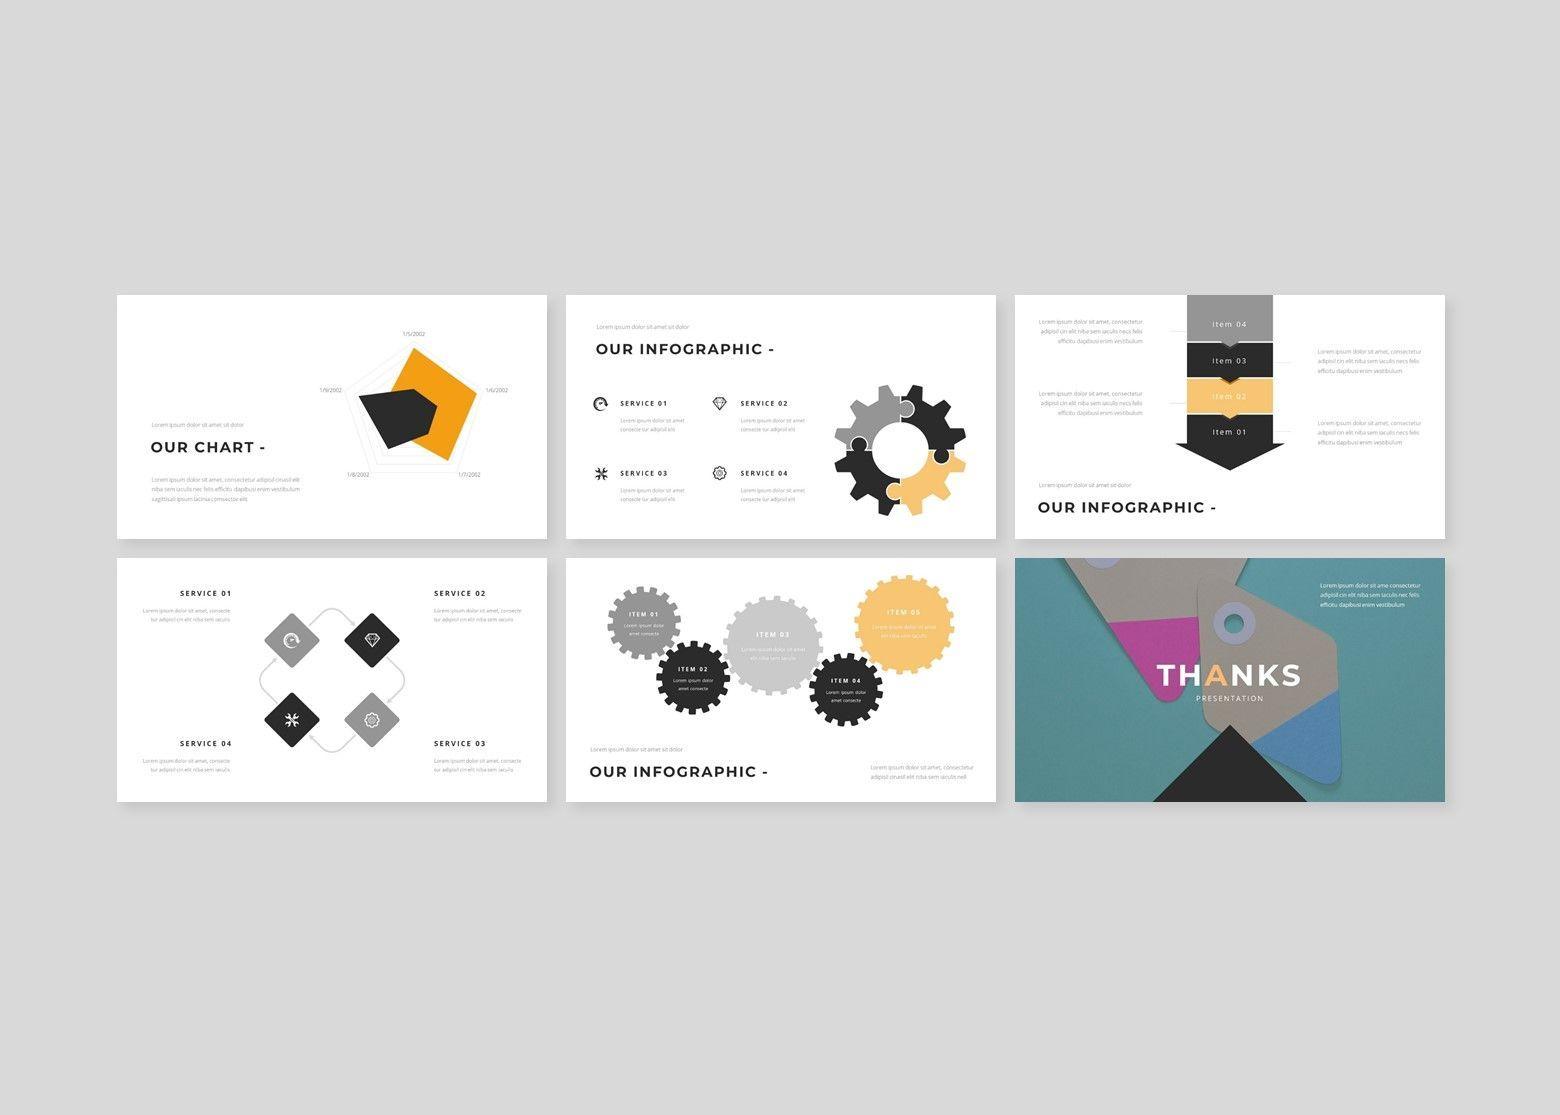 Fasionable – Creative Google Slide Business Template, Slide 5, 08642, Business Models — PoweredTemplate.com